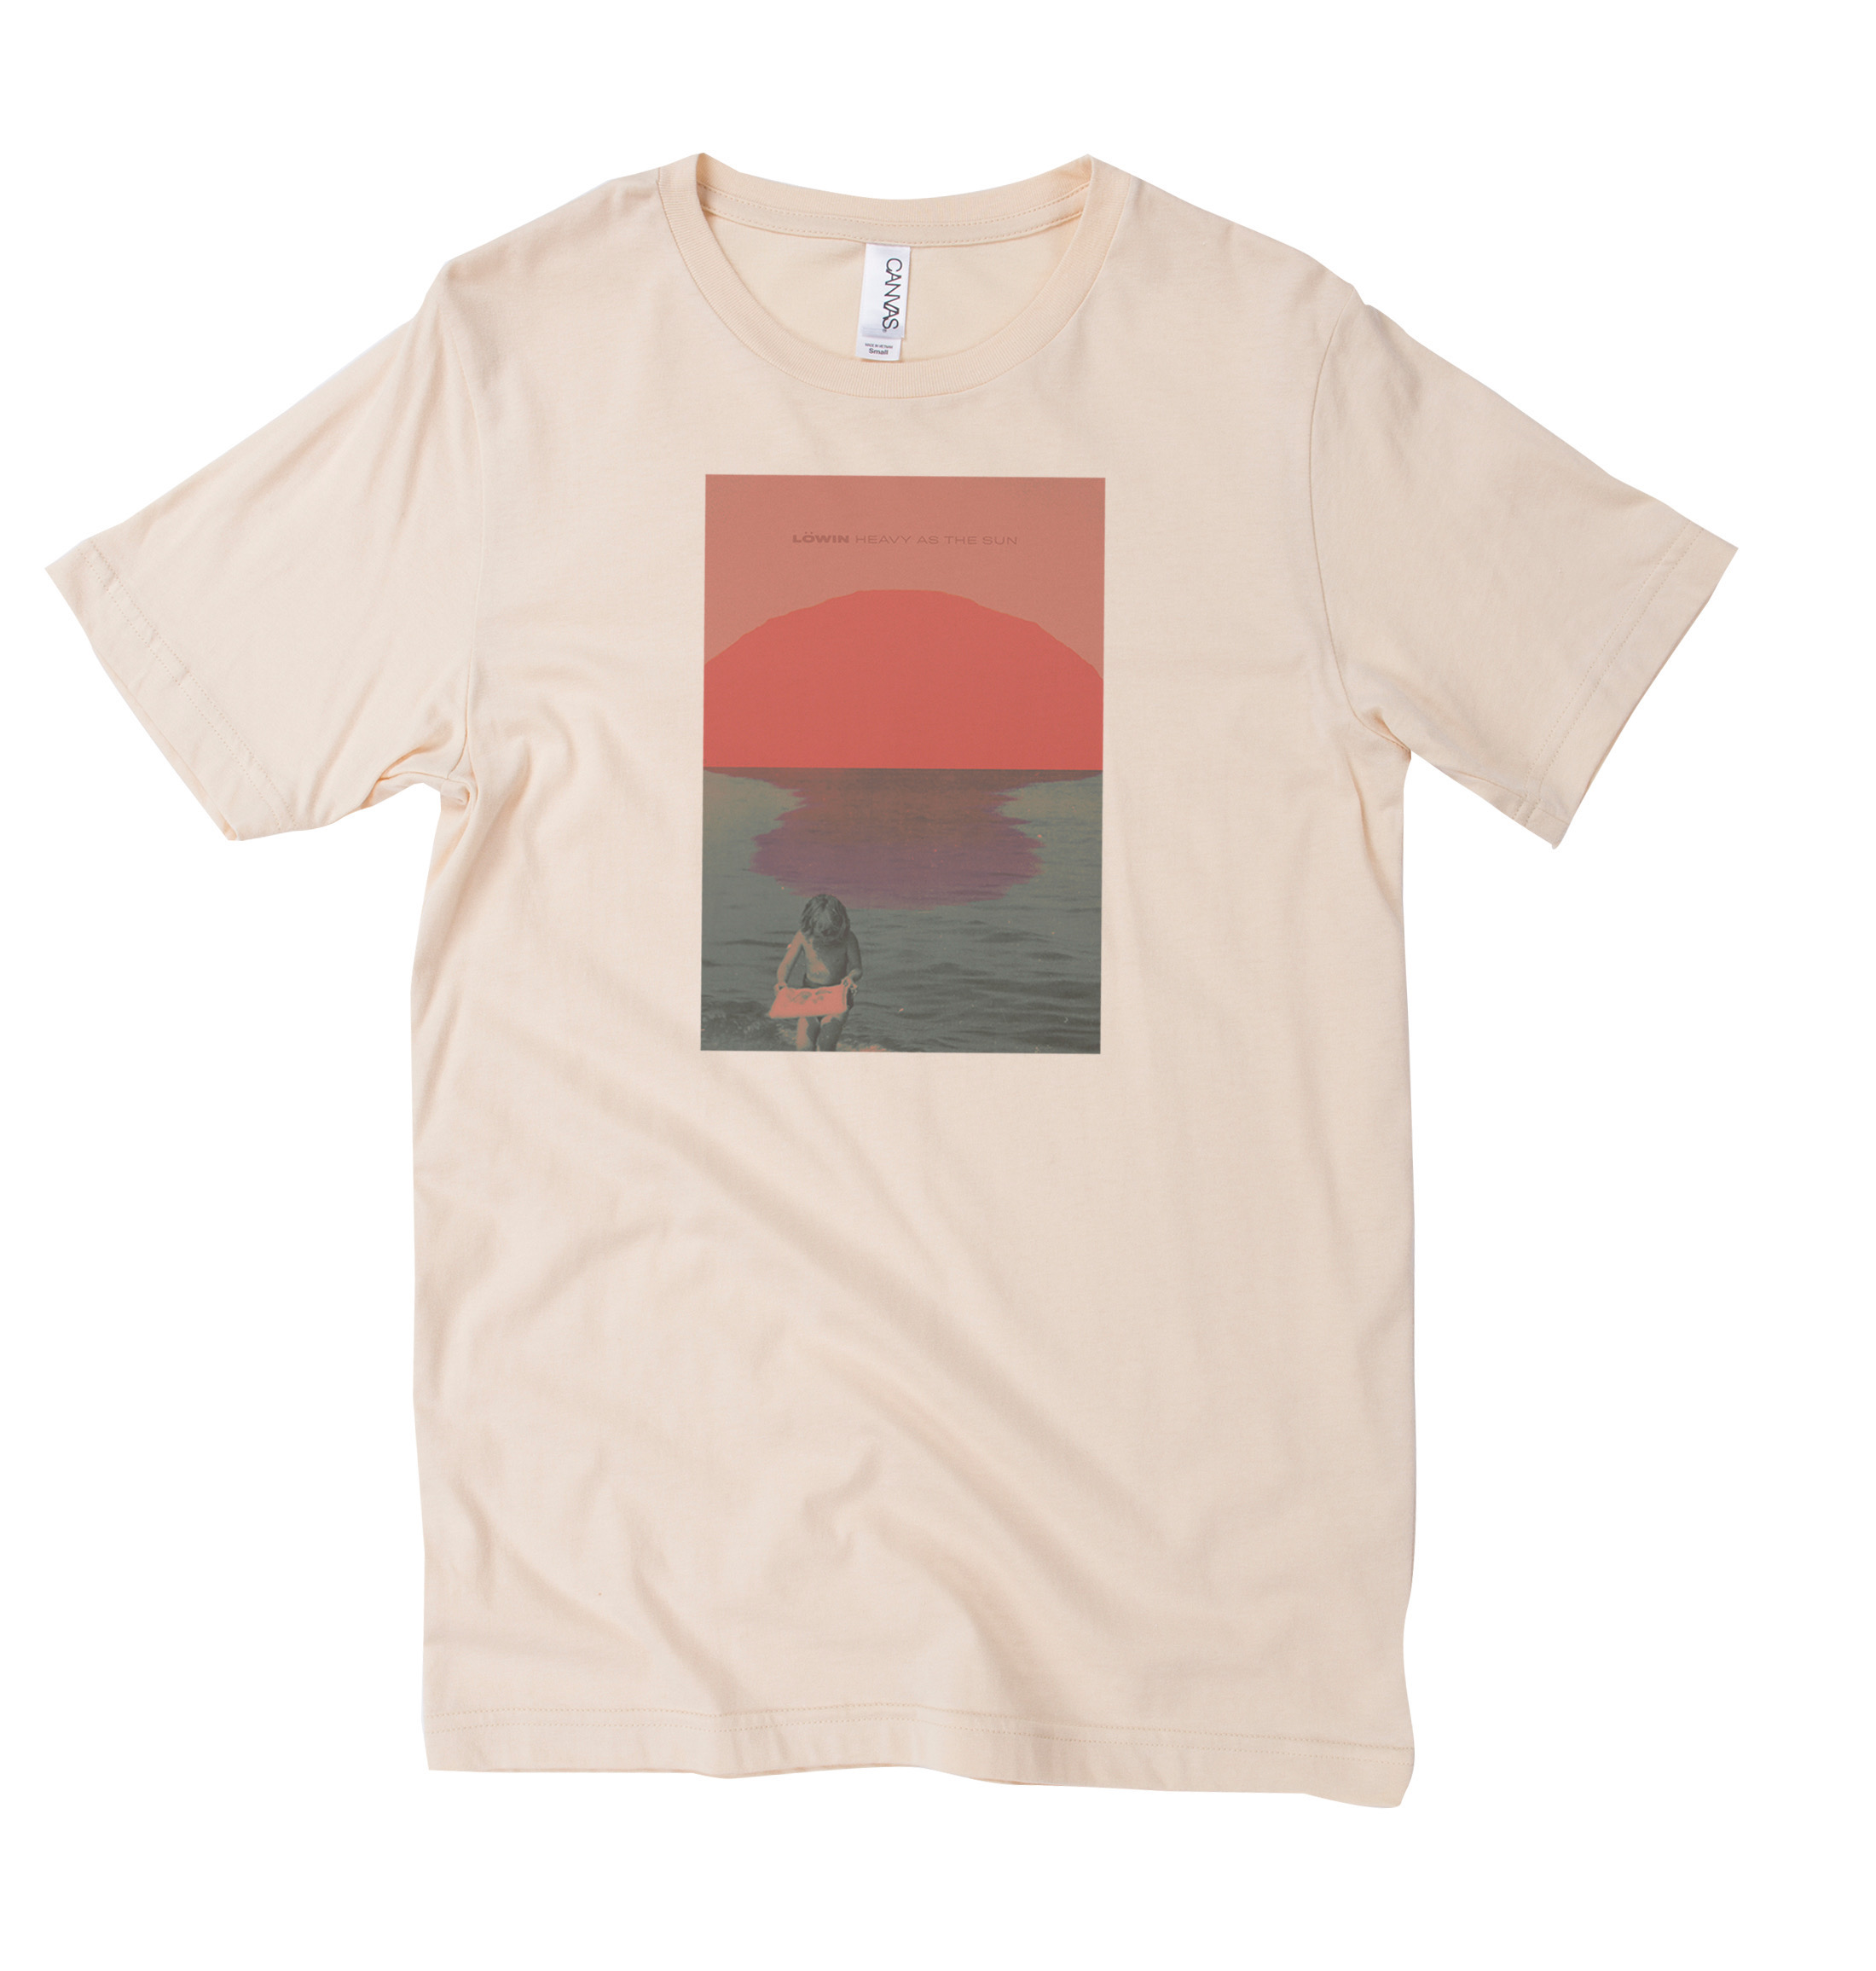 heavy_as_the_sun_tshirt.jpg